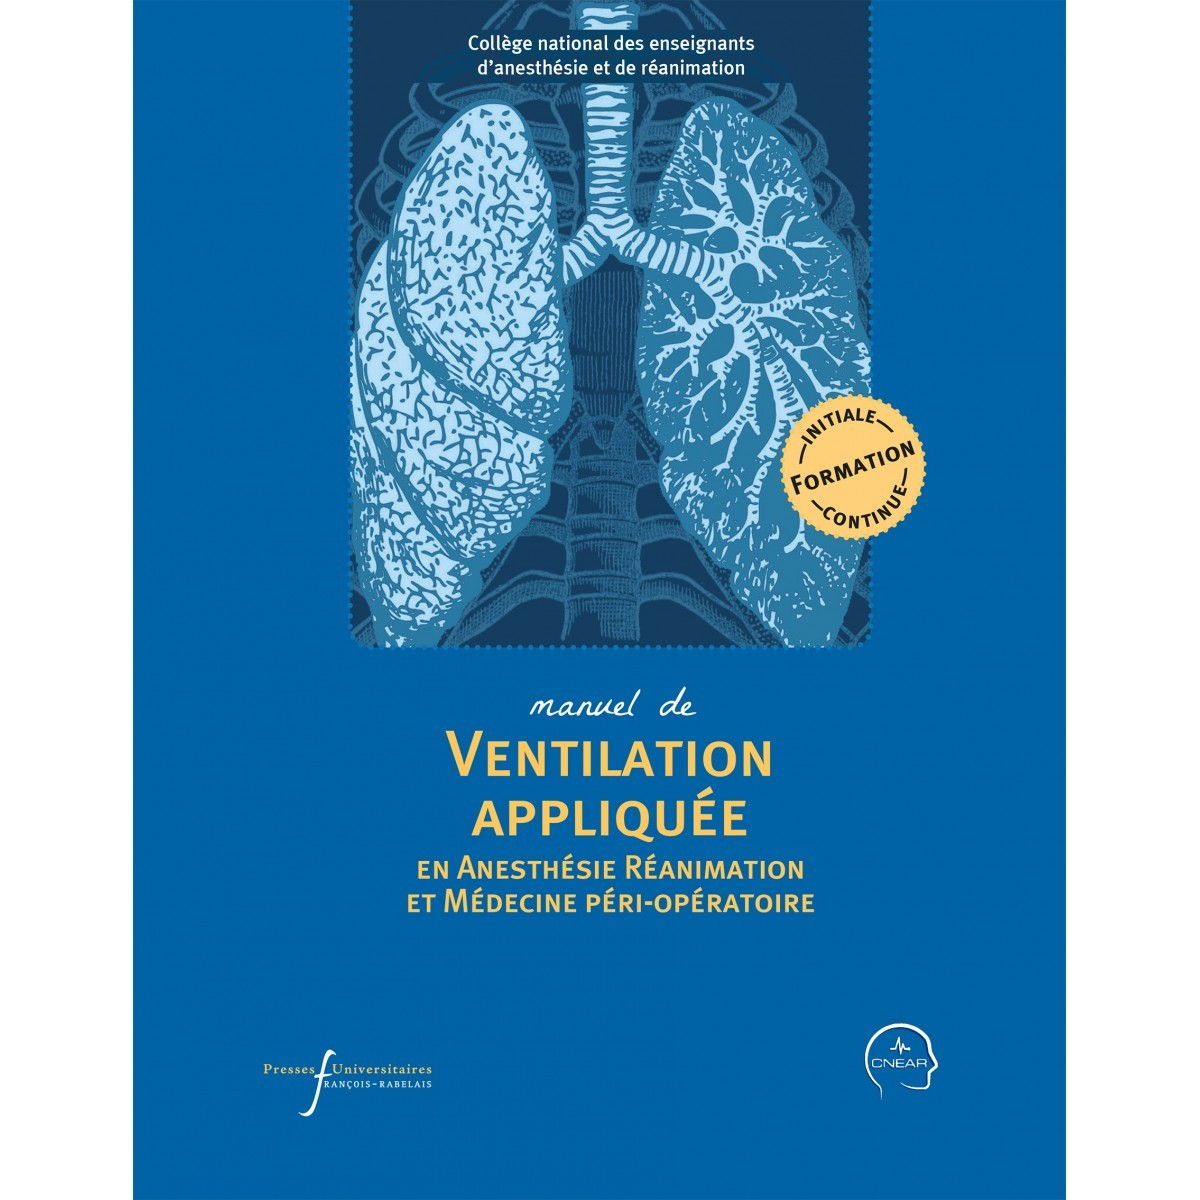 Manuel de ventilation appliquée